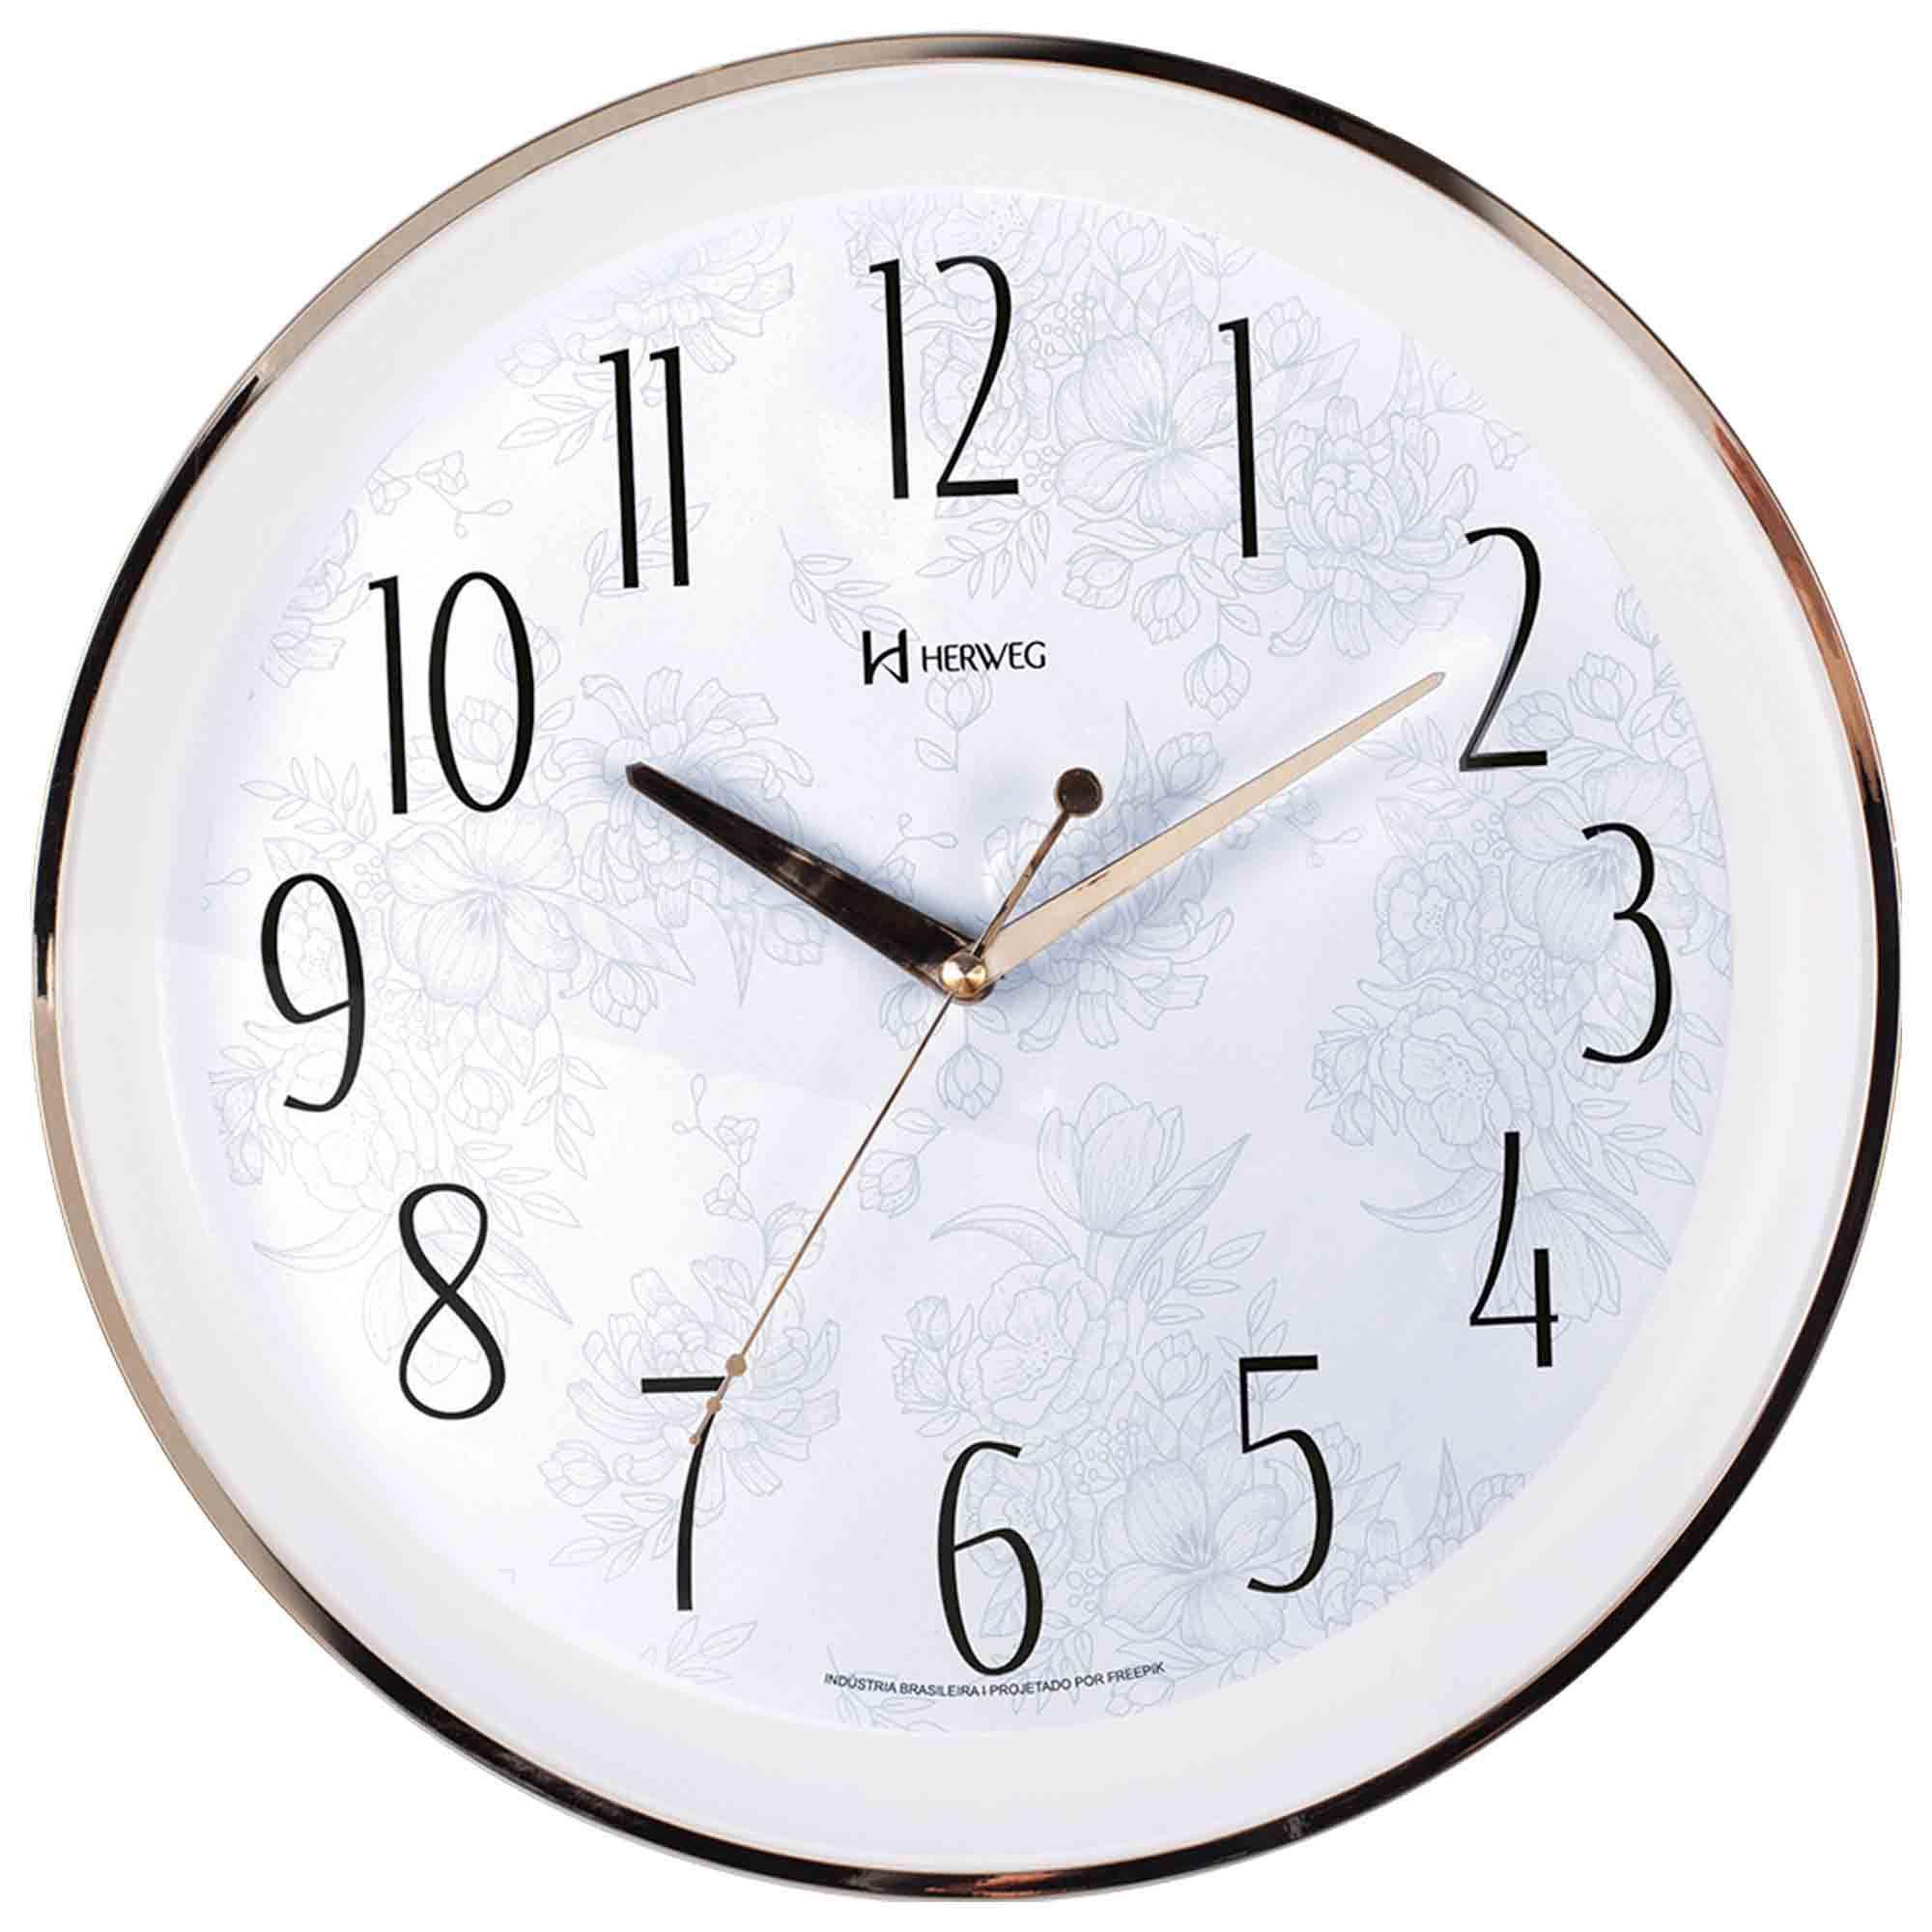 Relógio de Parede Analógico Herweg 6810 029 Dourado Claro